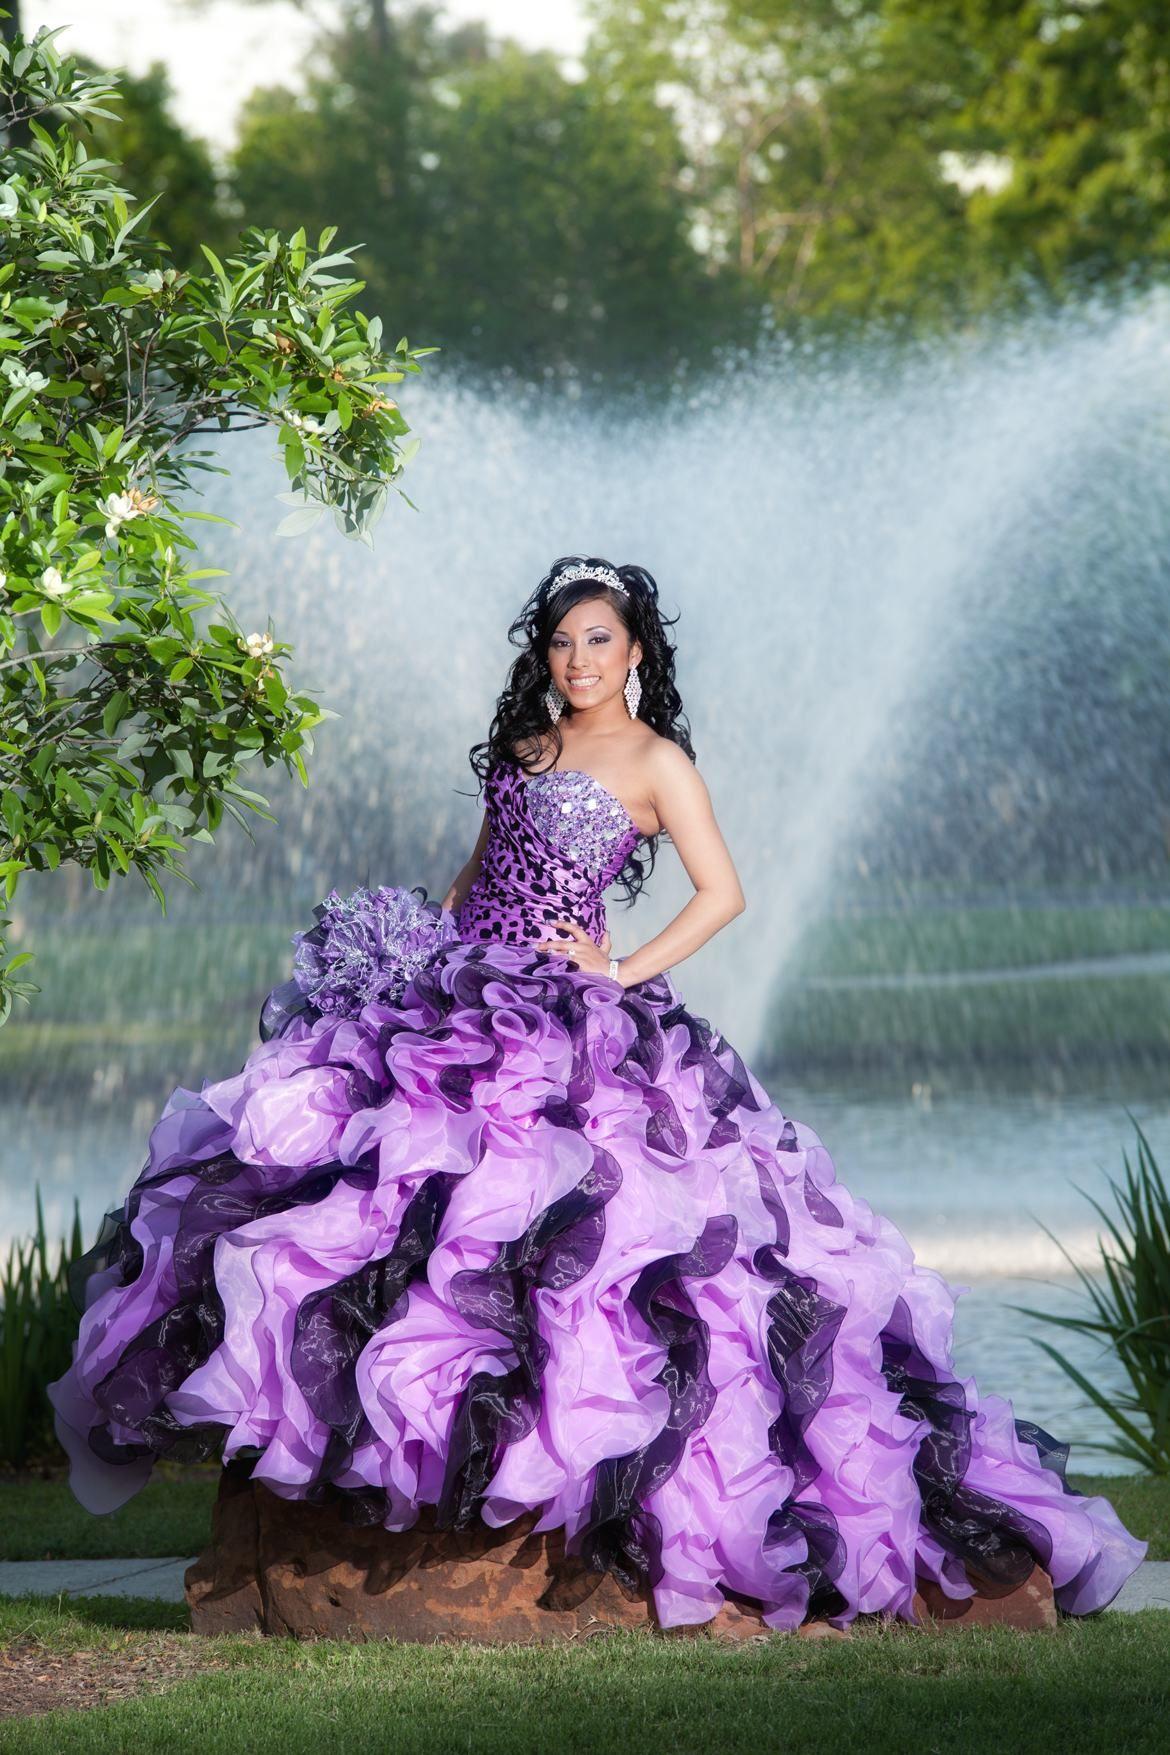 Quince Photographers   Chica - lila (púrpura)   Pinterest   Púrpura ...